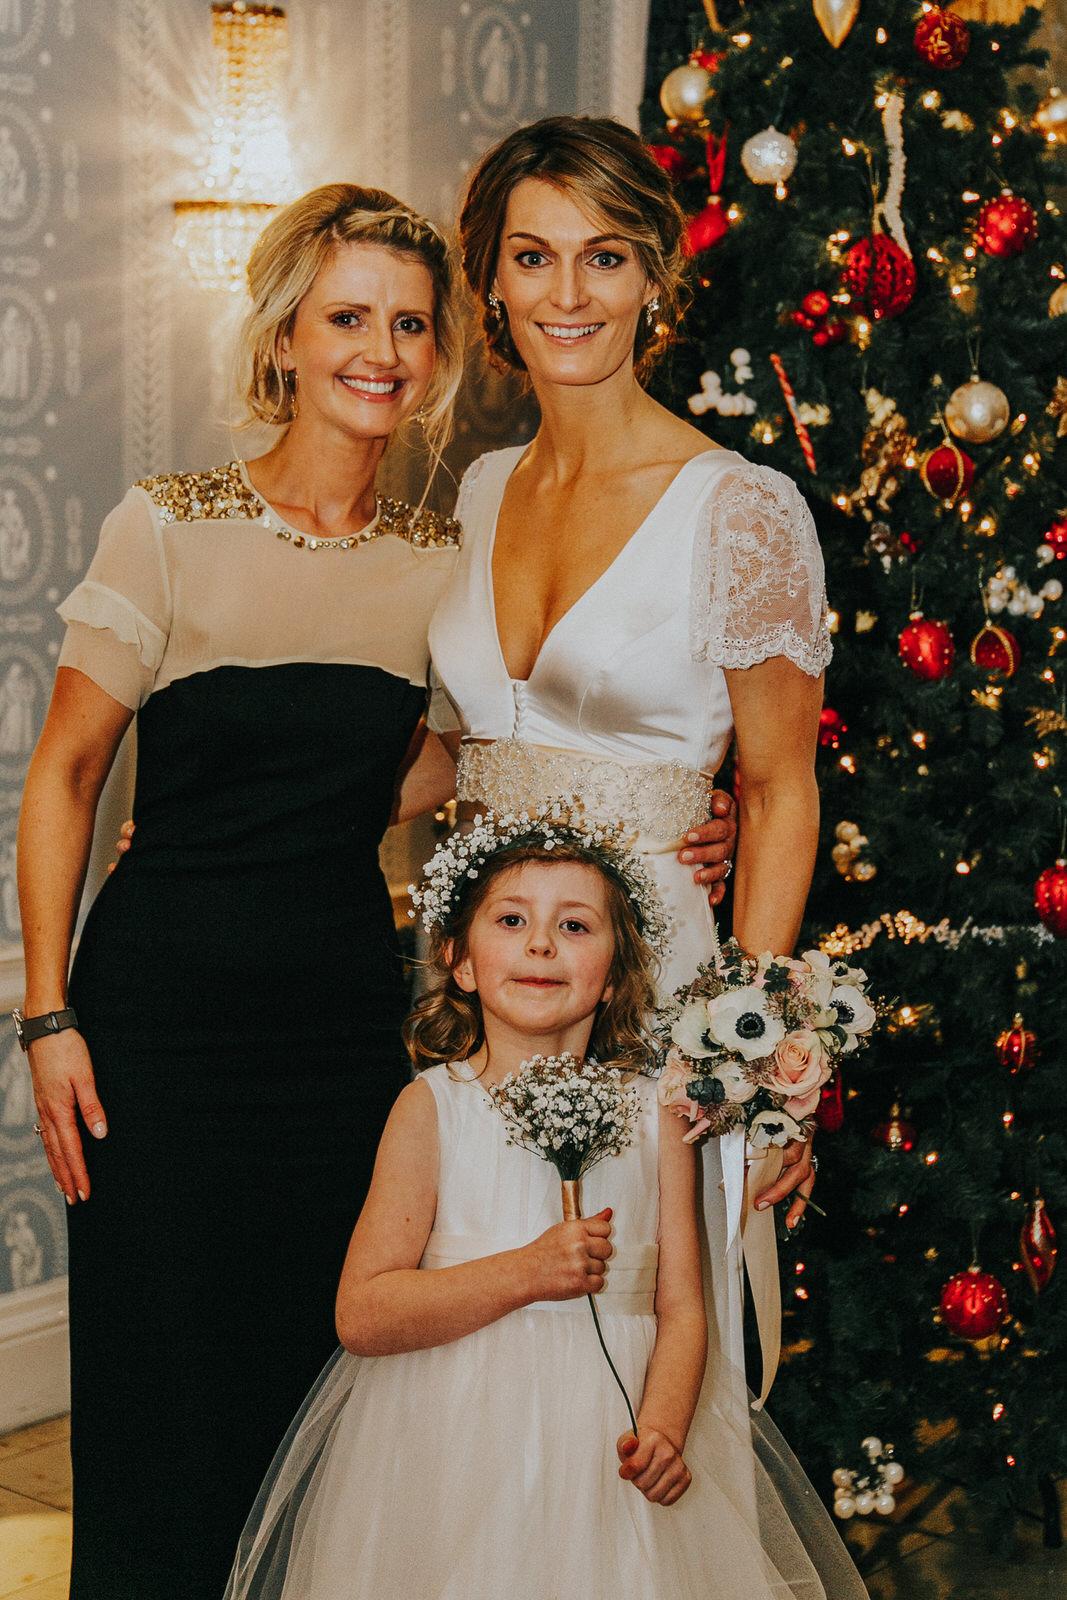 Dunbrody_House_Wedding_photographer_105.jpg